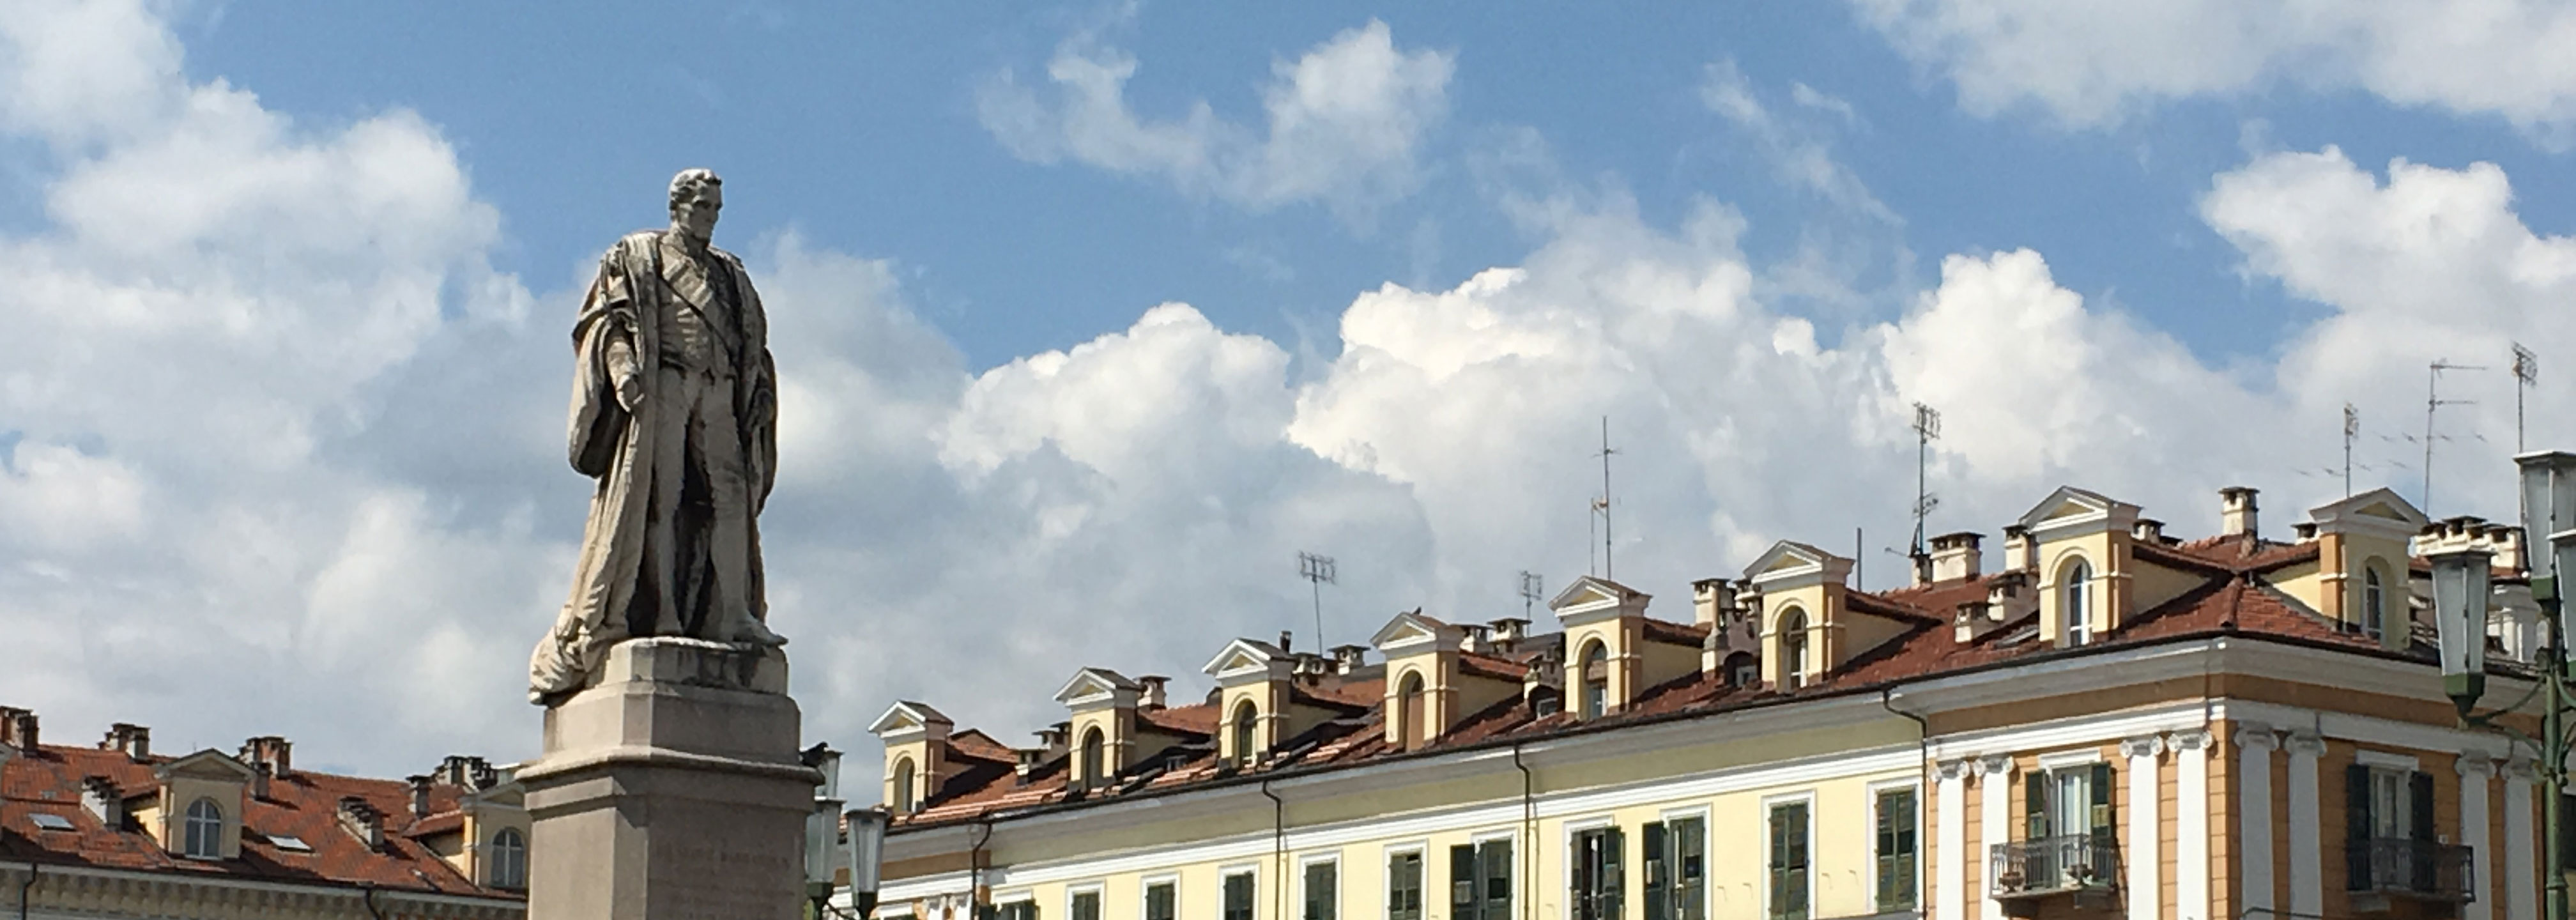 Immagine Piazza Galimberti